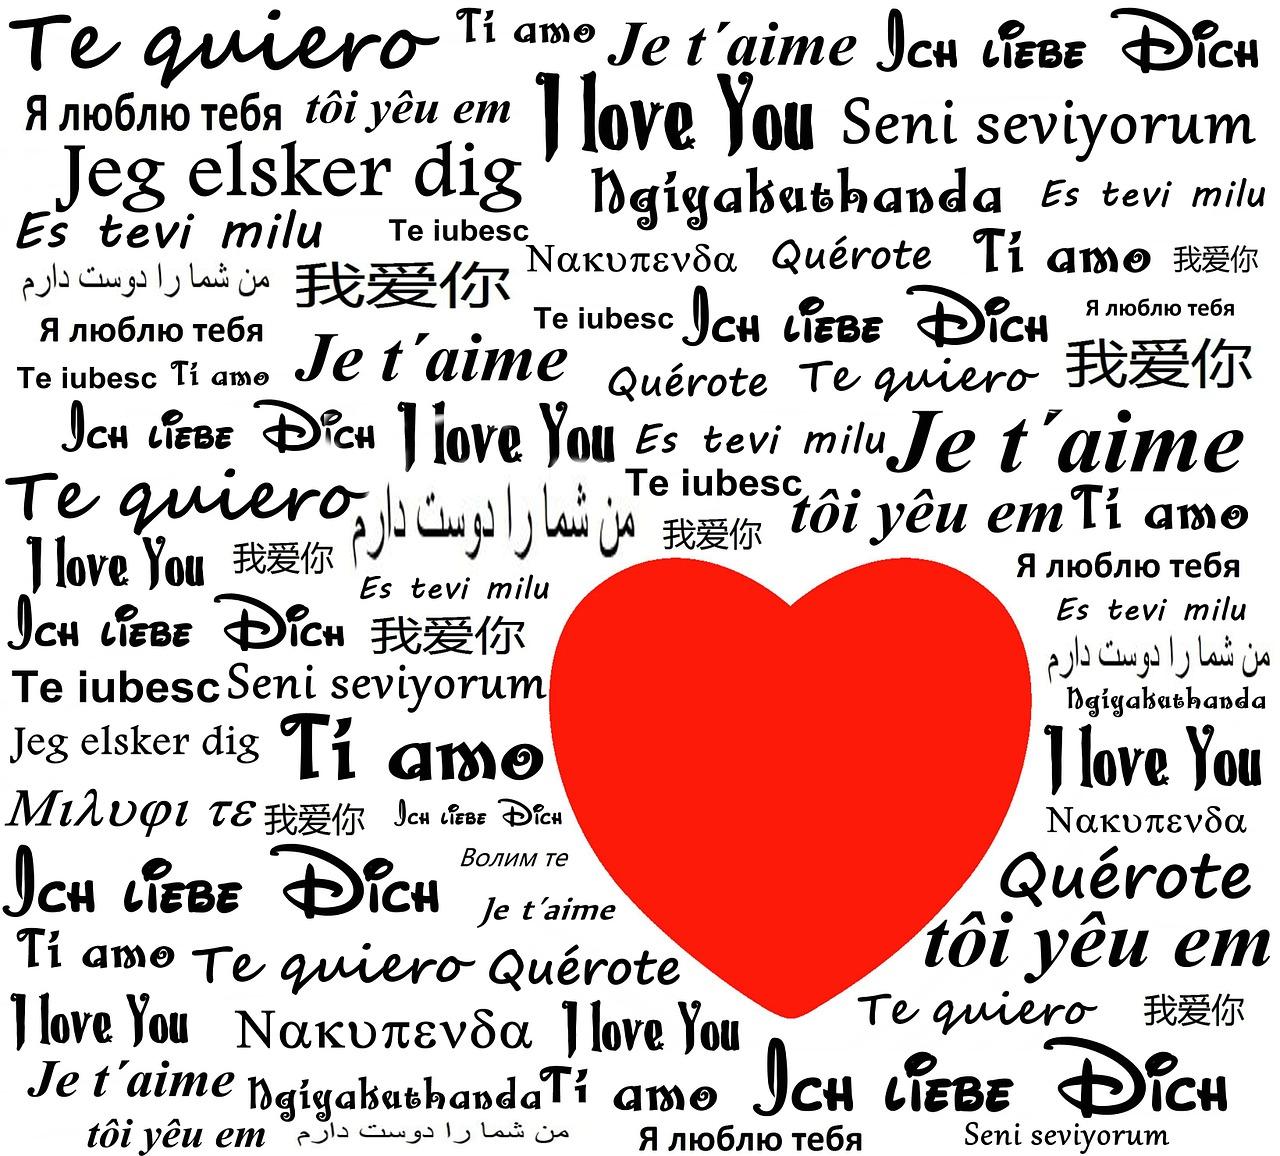 """Je t'aime"", le meilleur single de la chanteuse Lara Fabian"